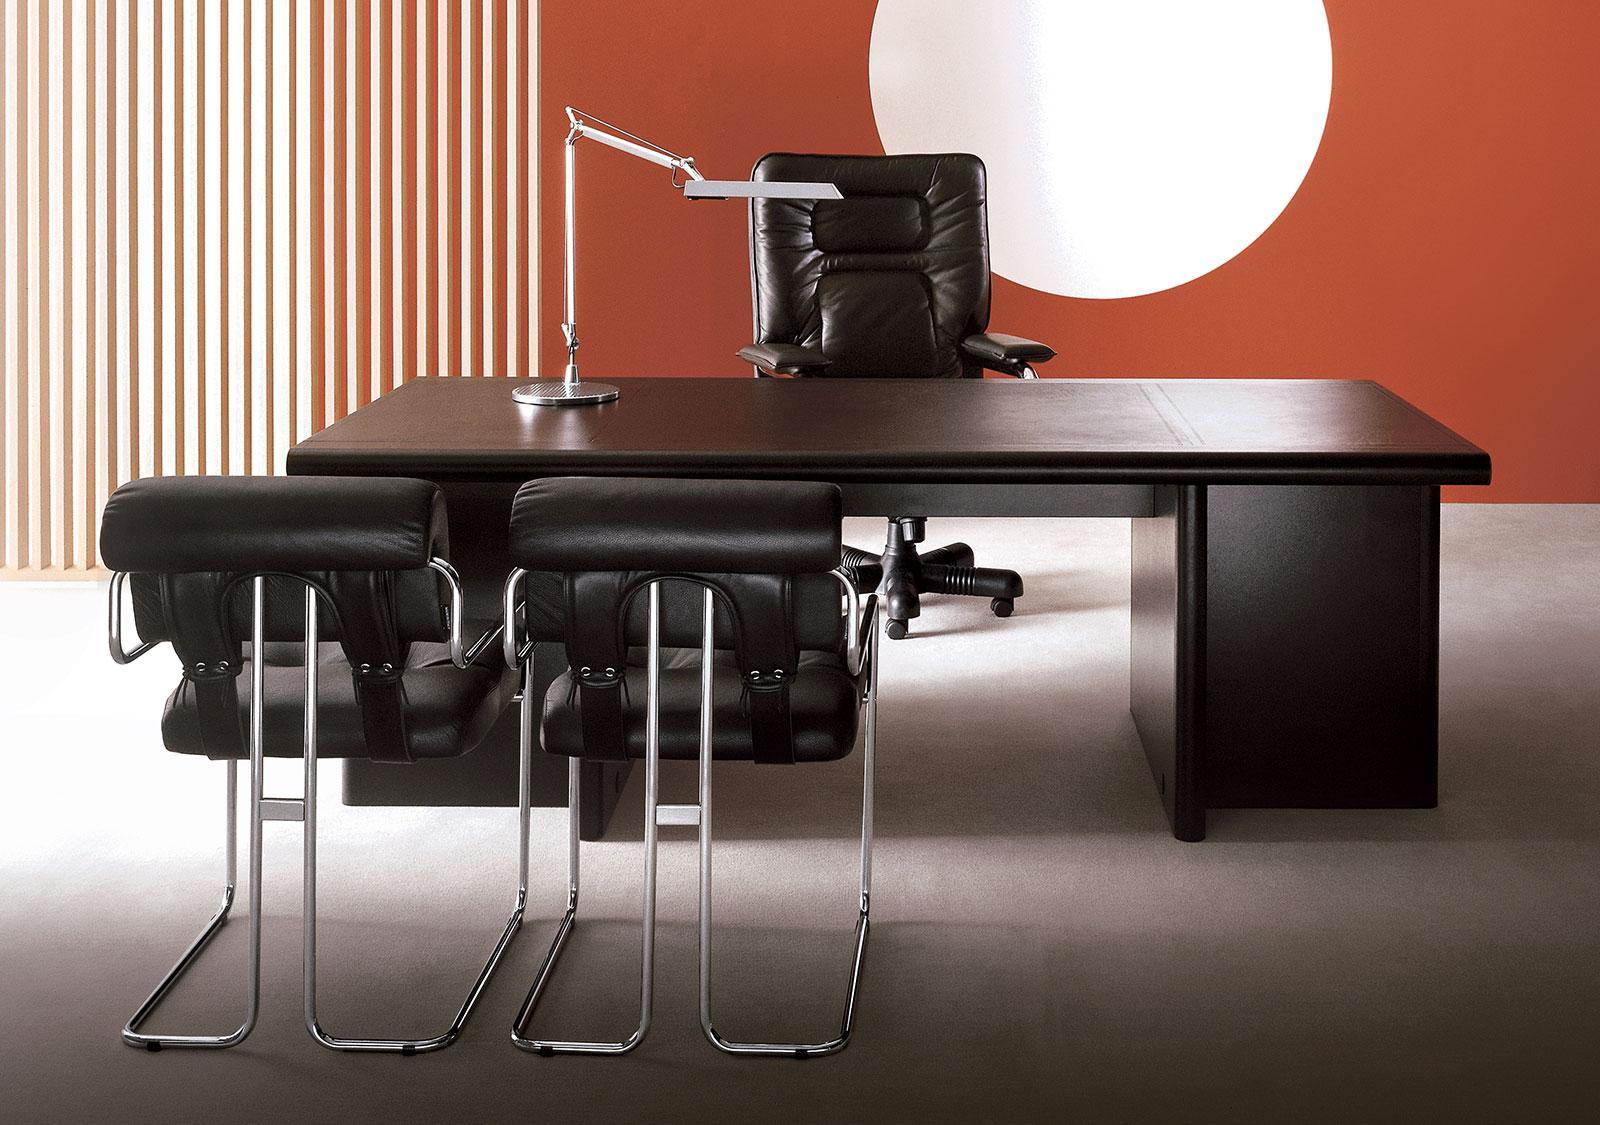 Tucroma Padded Chrome Frame Leather Covered Chair Shop Online Italy Dream Design